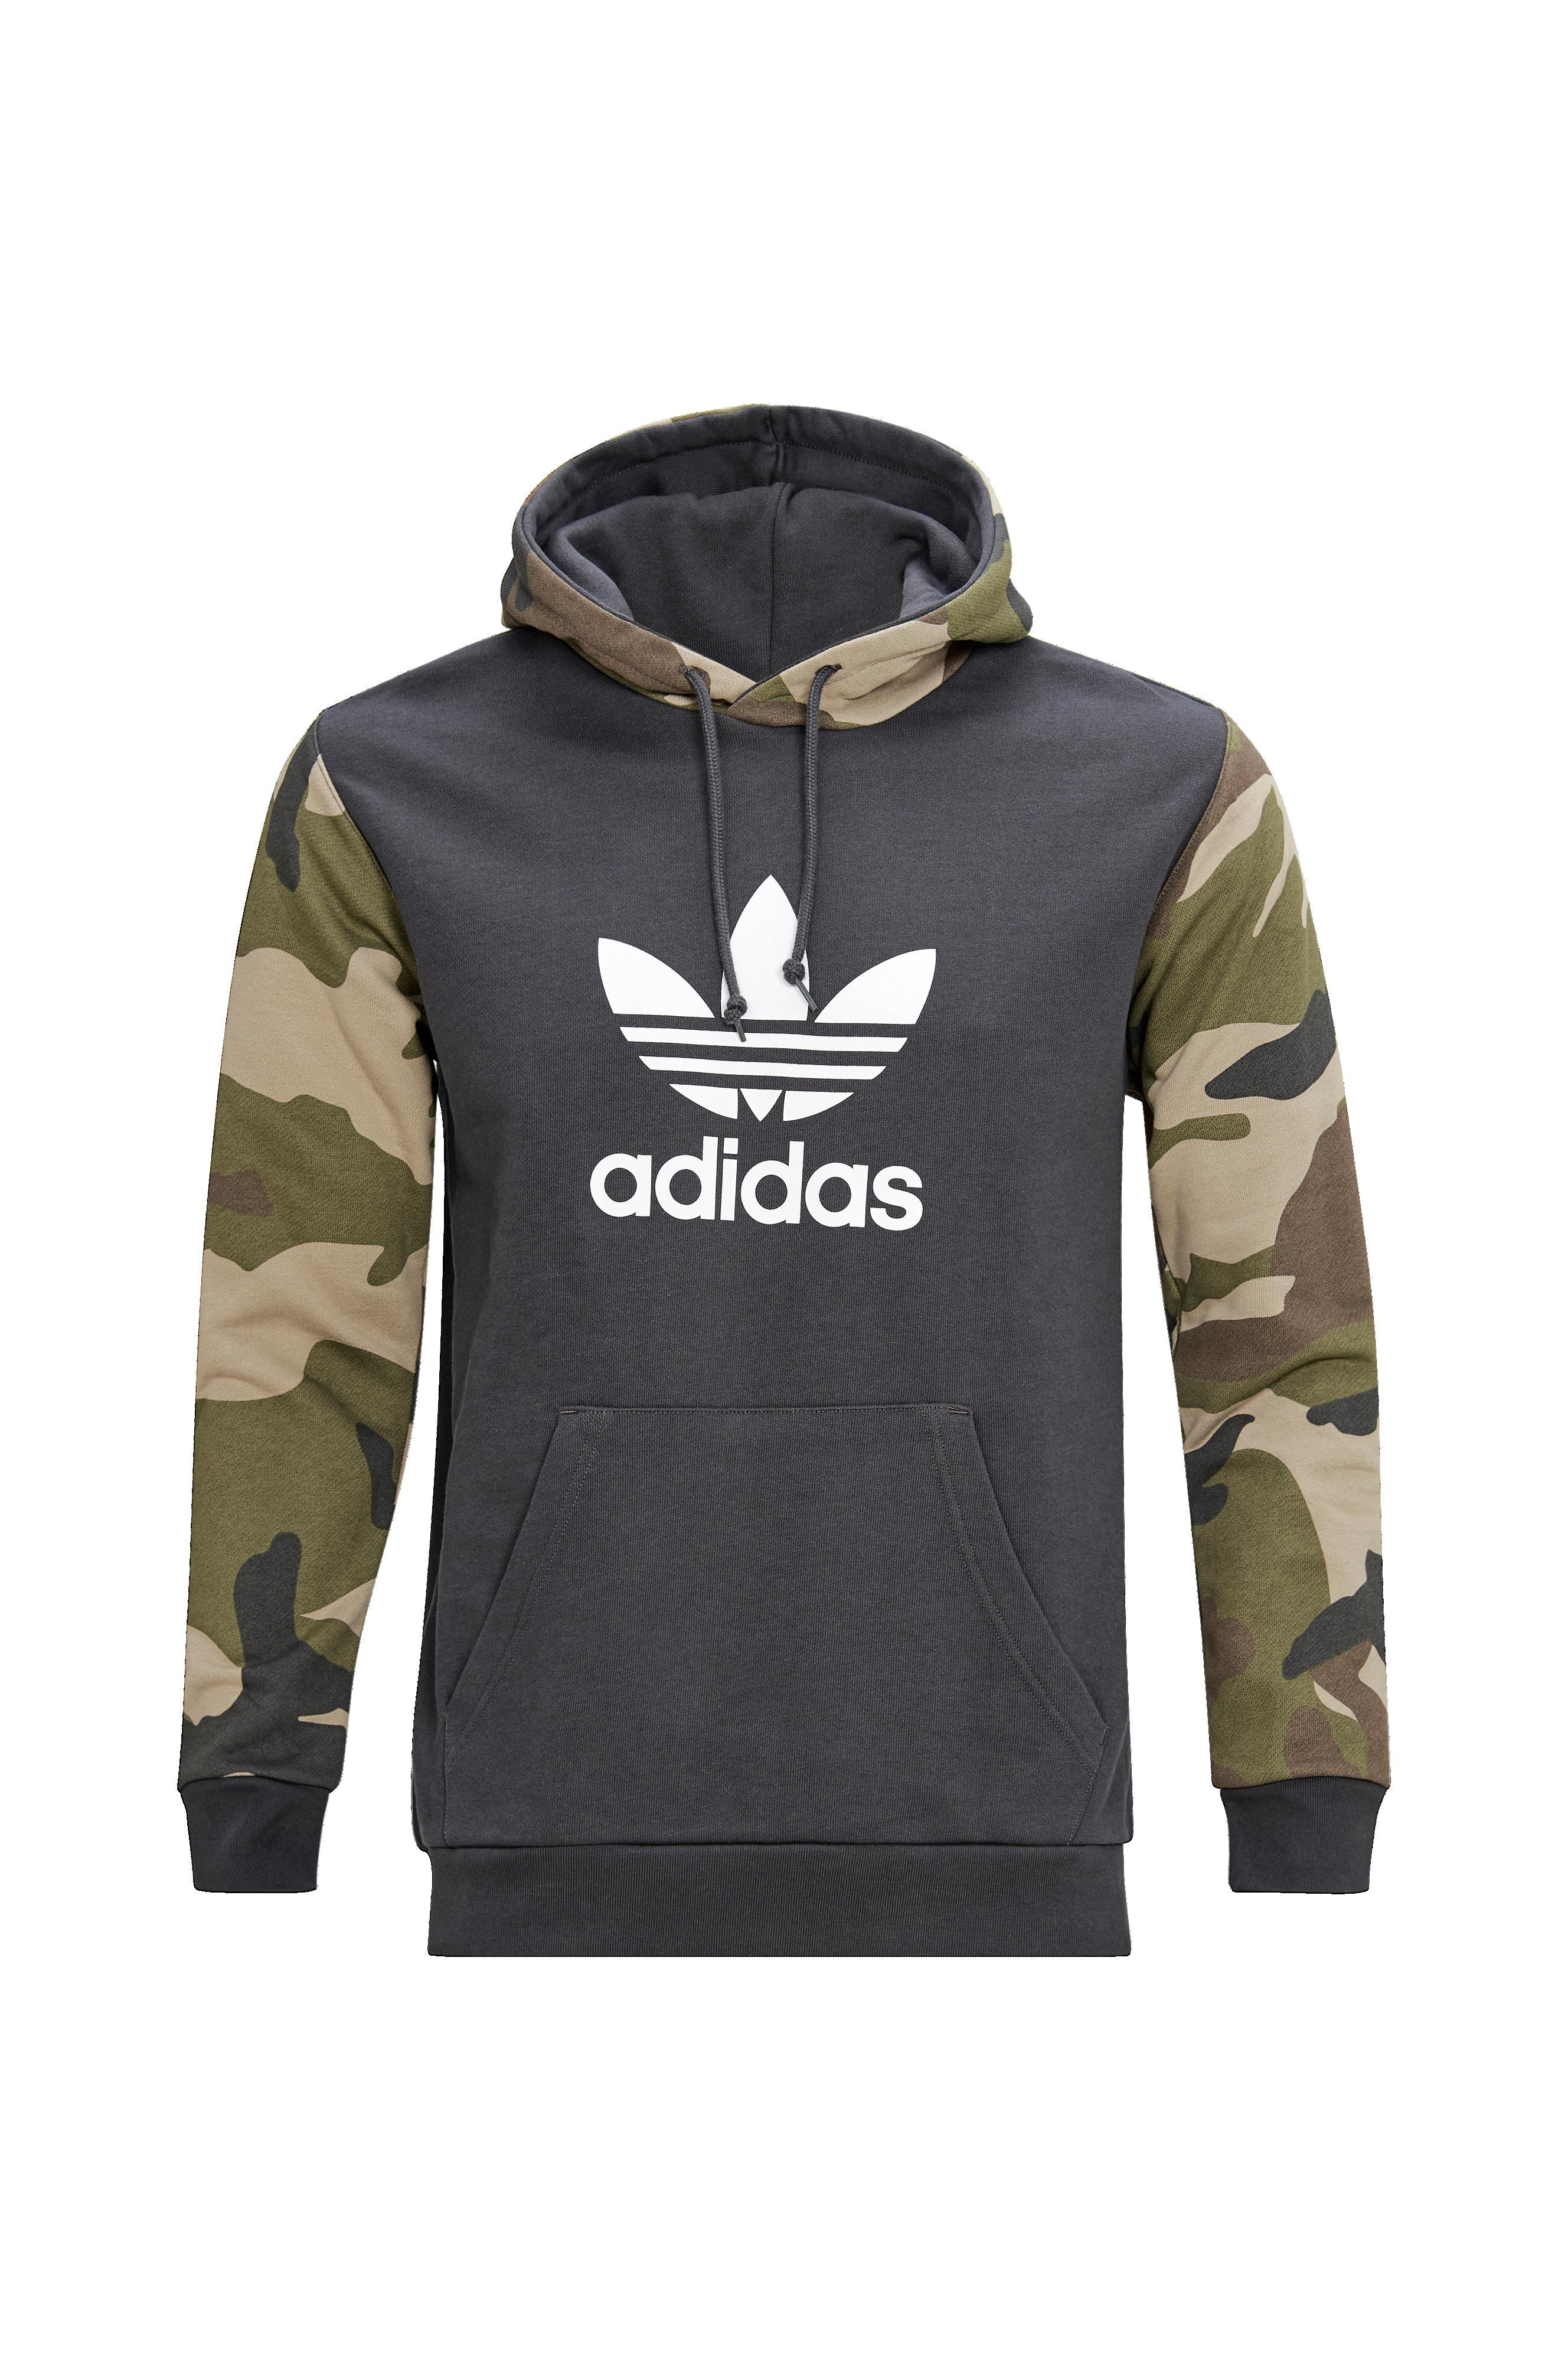 adidas Originals Huvtröja Camouflage Hoodie Grön